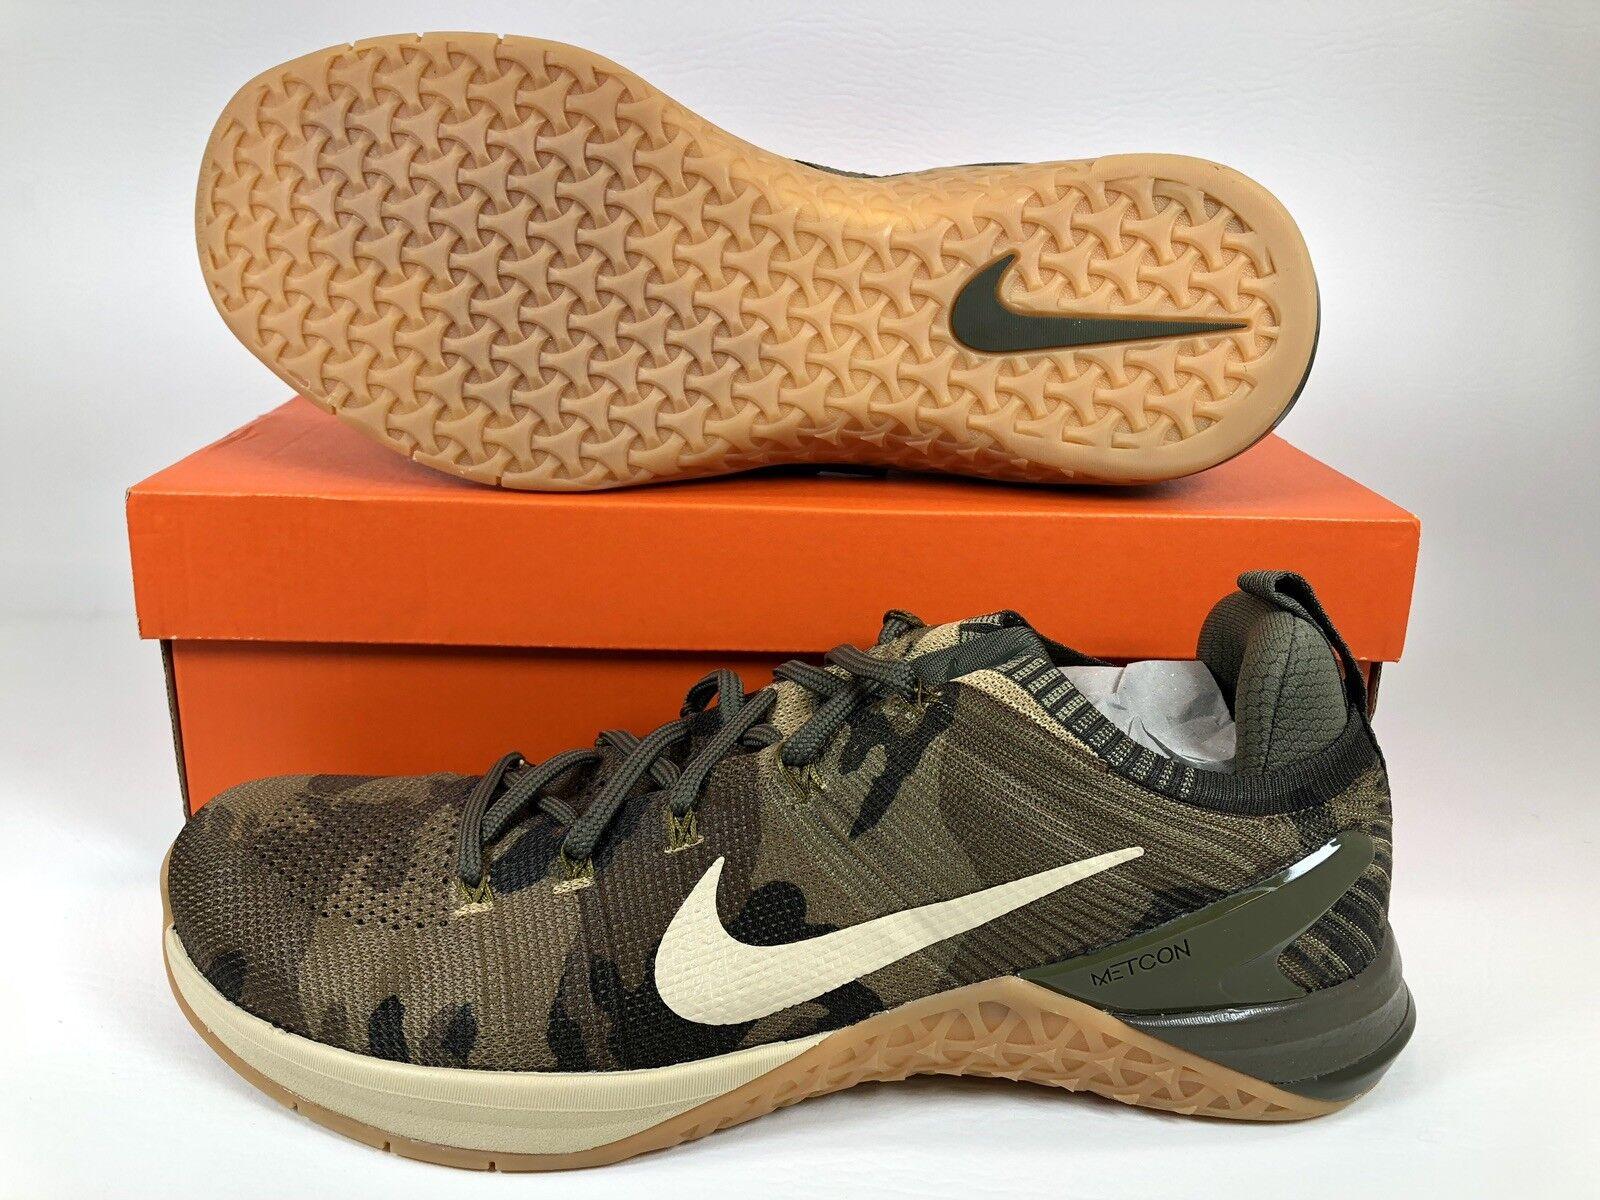 Nike Metcon DSX Flyknit 2 Men Cross Training shoes SZ 12.5 Olive Camo 924423-300